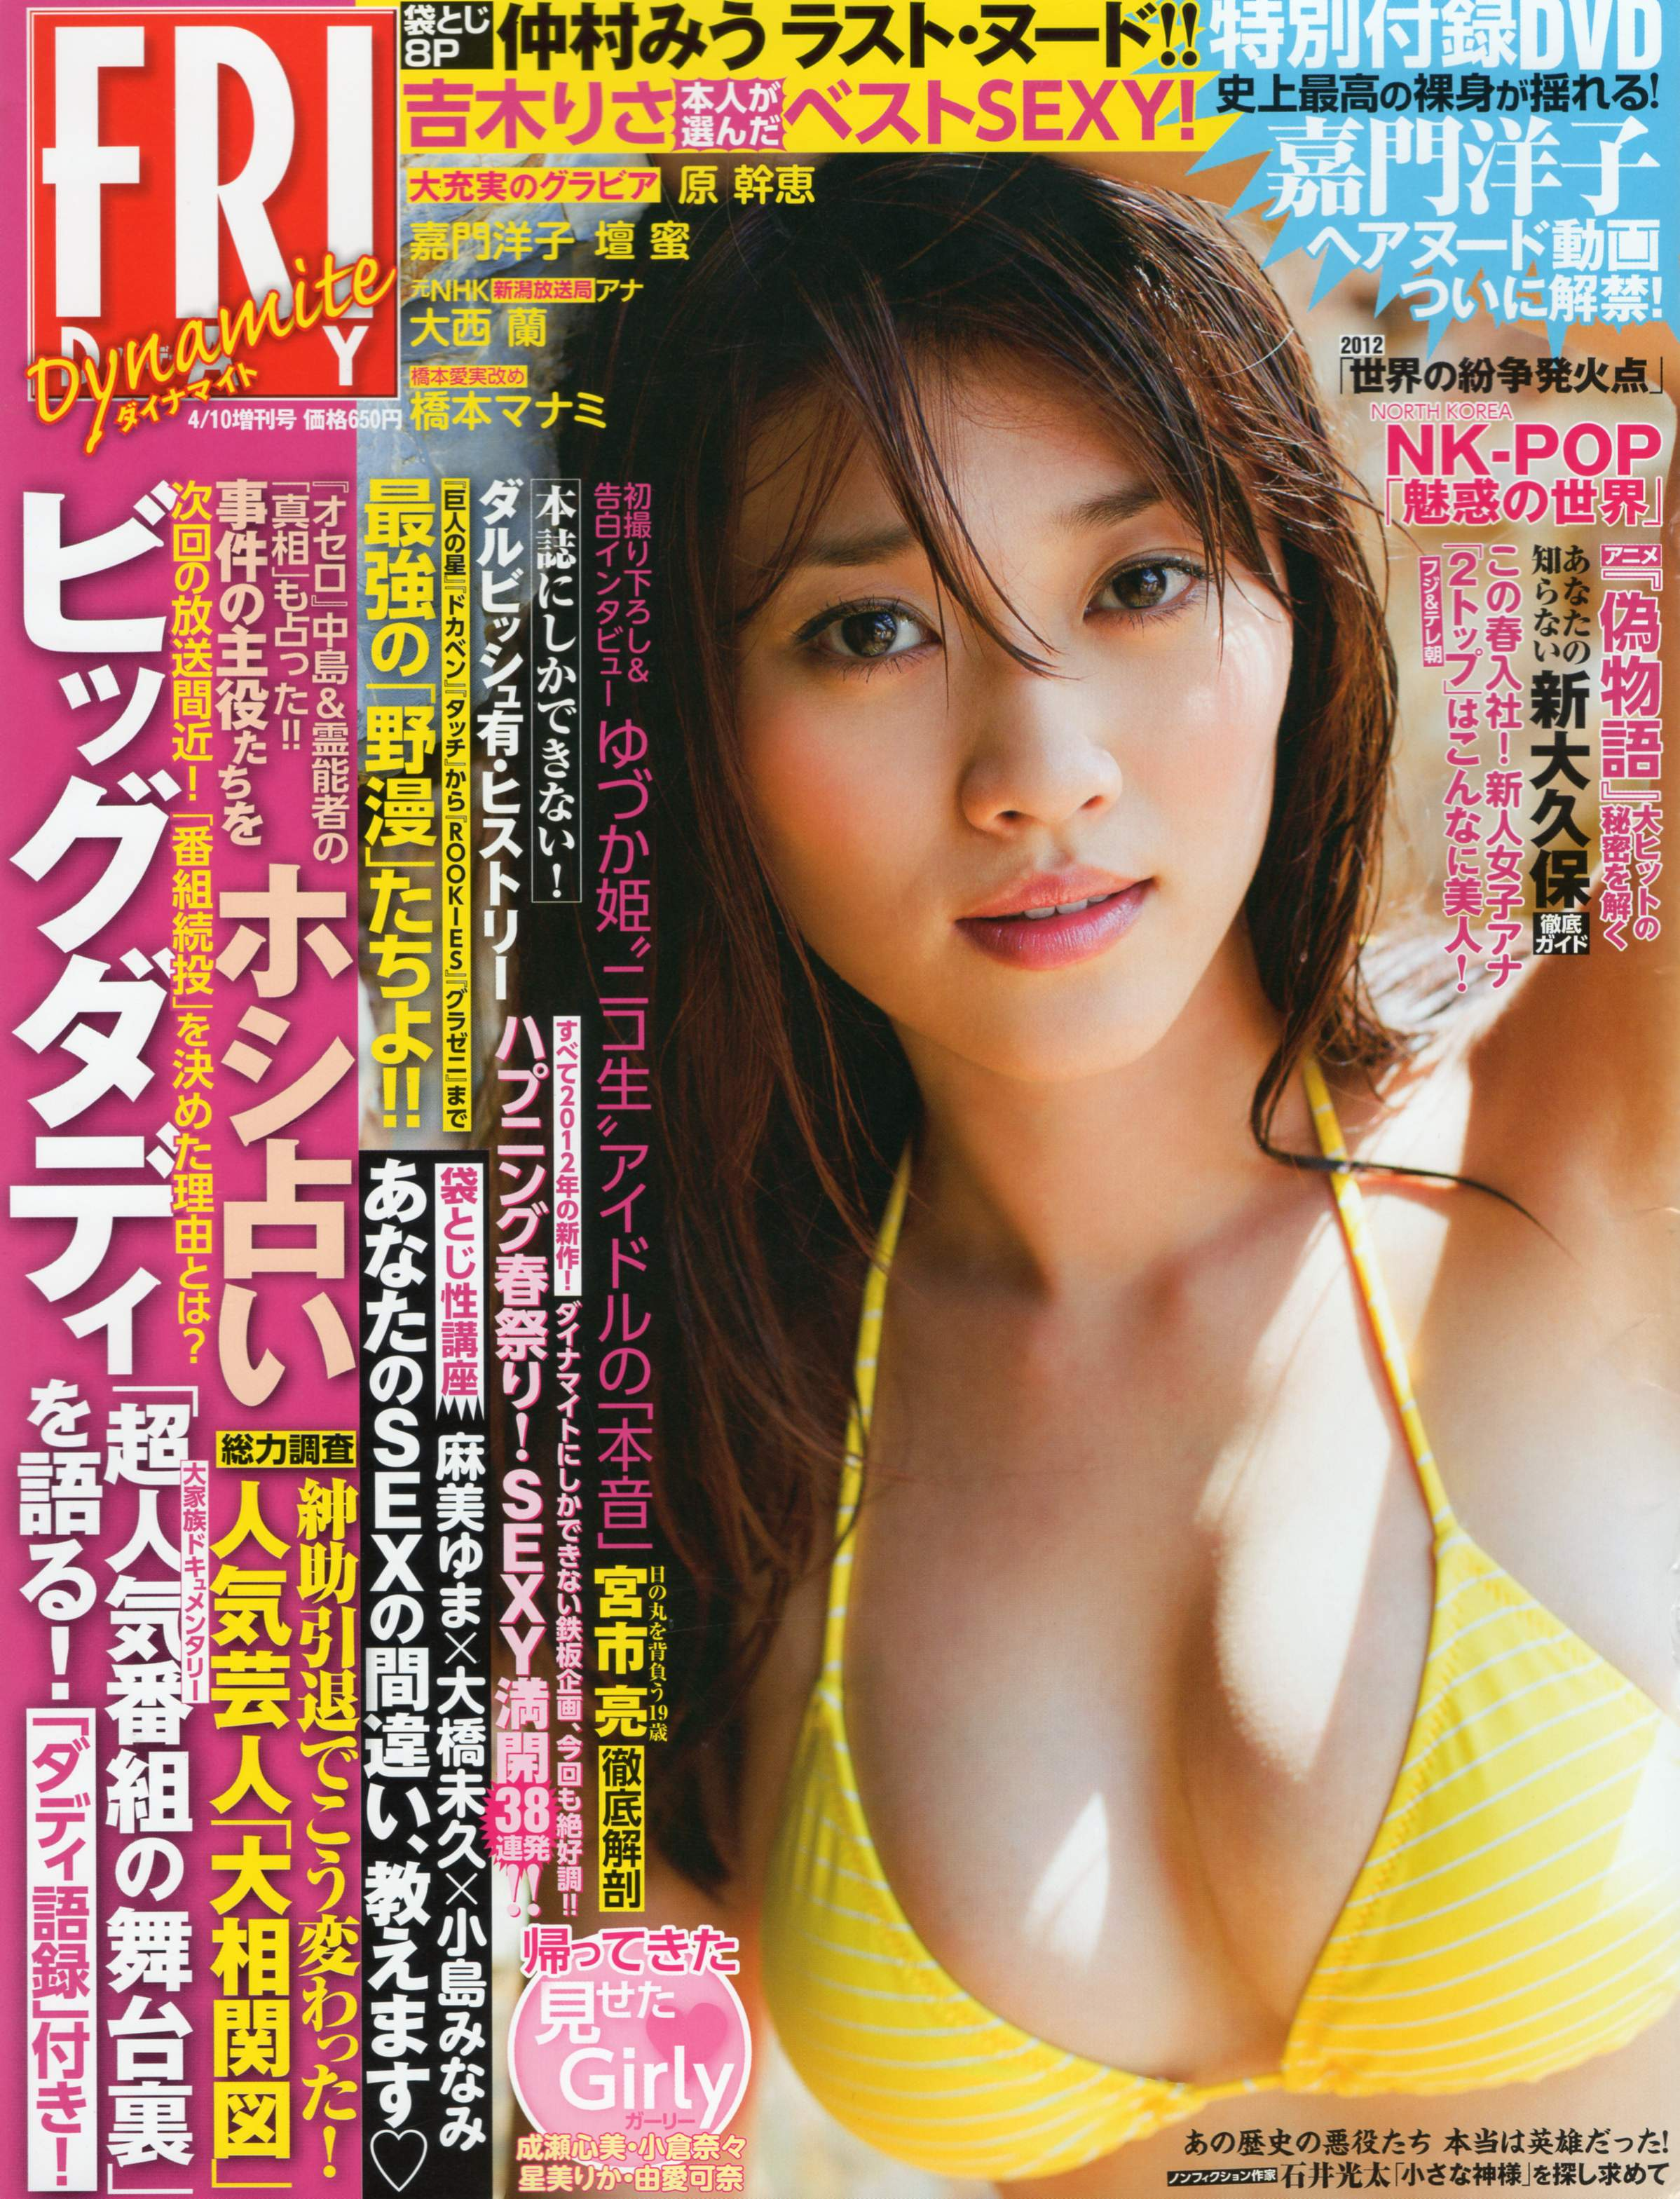 [FRIDAY Dynamite] 2012.04.10 Mikie Hara 原幹恵 [76P44MB]